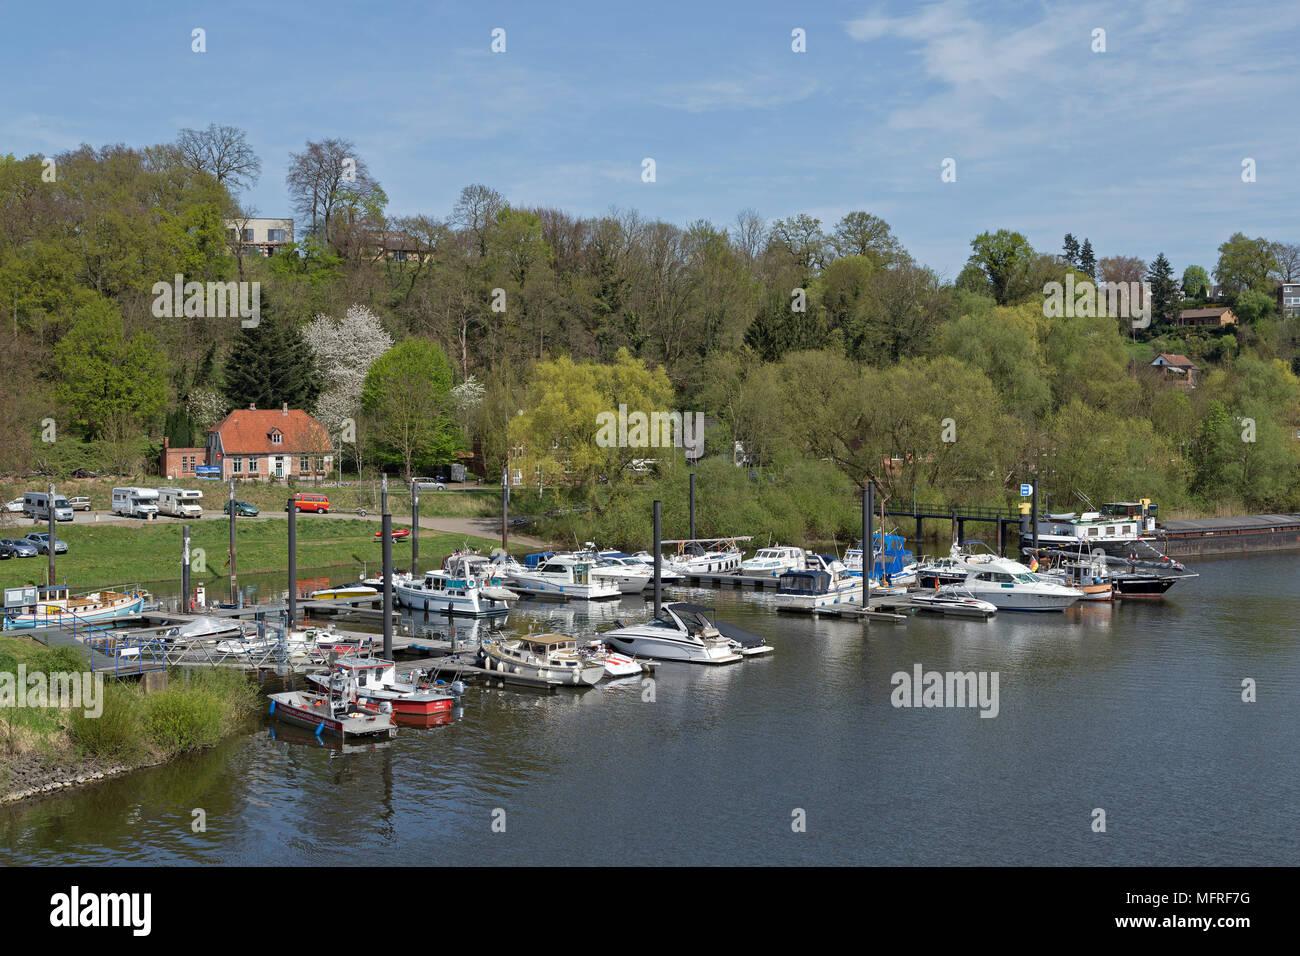 marina, Lauenburg, Schleswig-Holstein, Germany - Stock Image